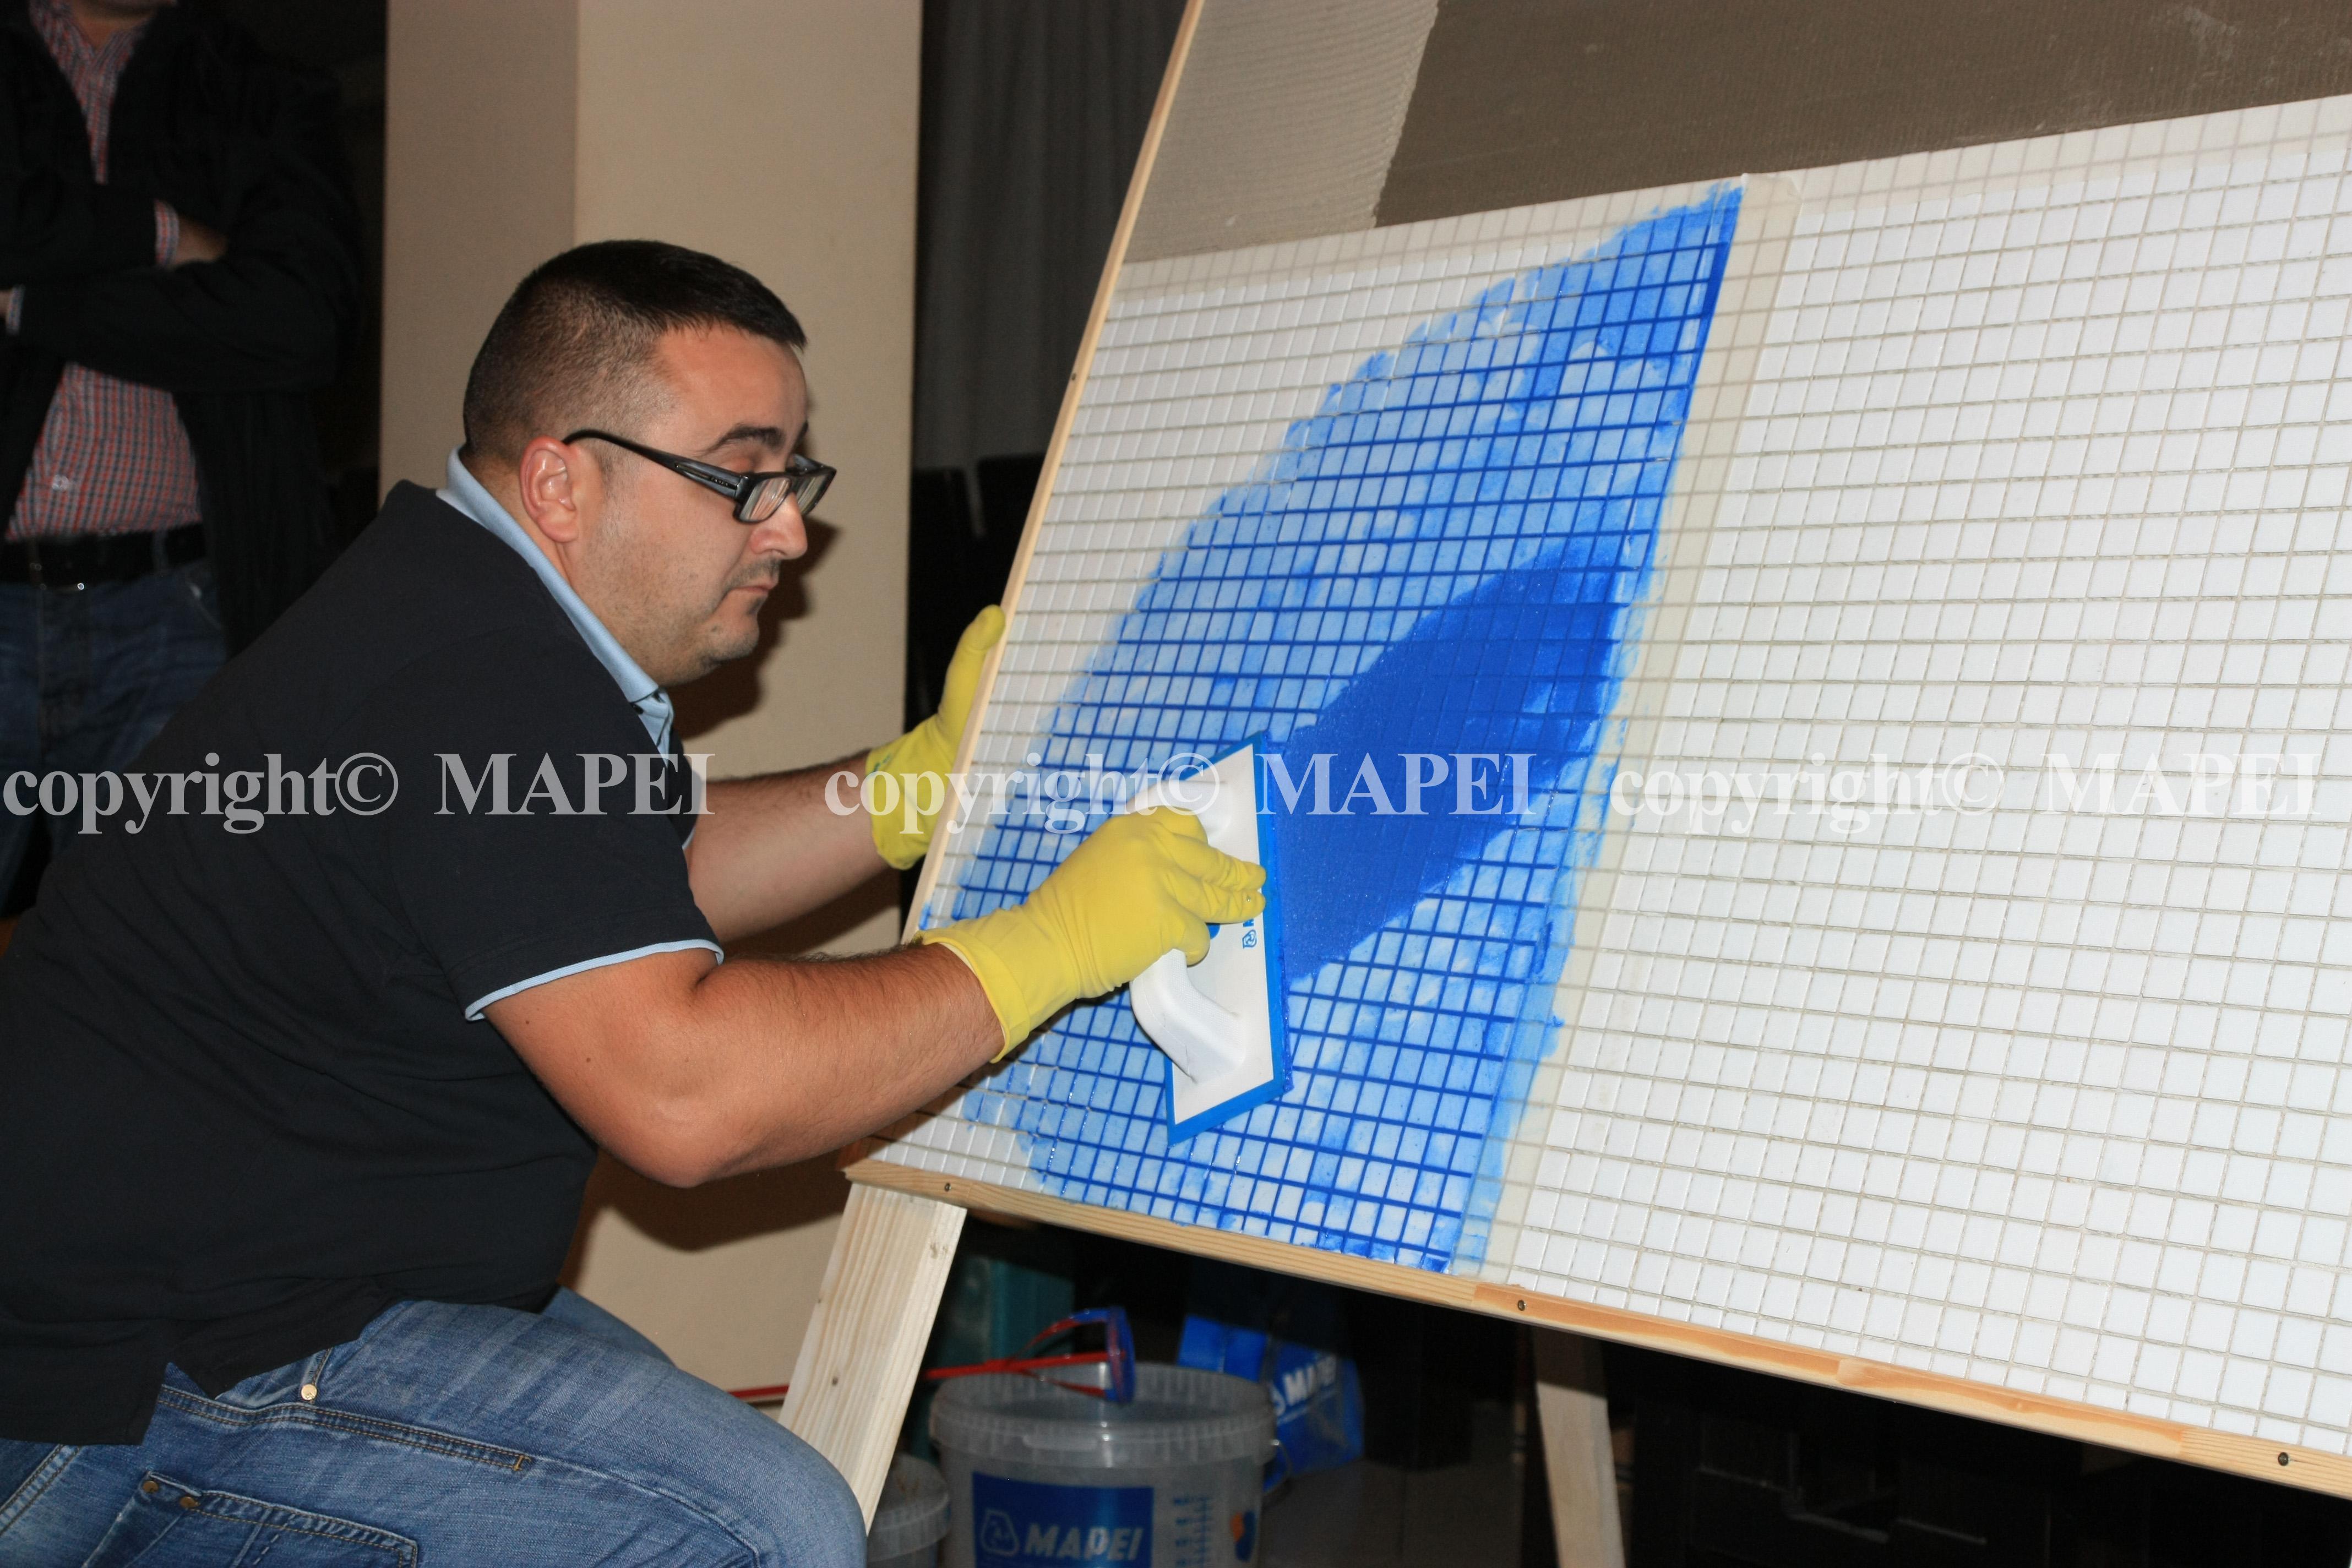 14. intindere chit epoxidic rosturi mozaic sticla MAPEI - Poza 14